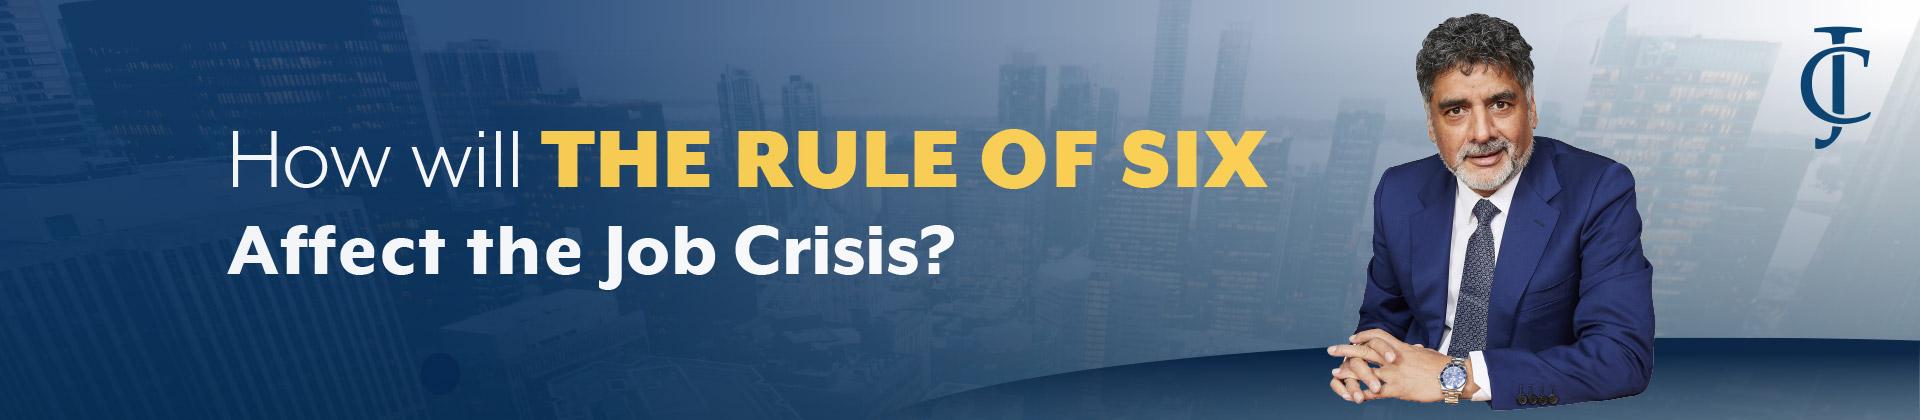 Rule of Six Affect the Job Crisis